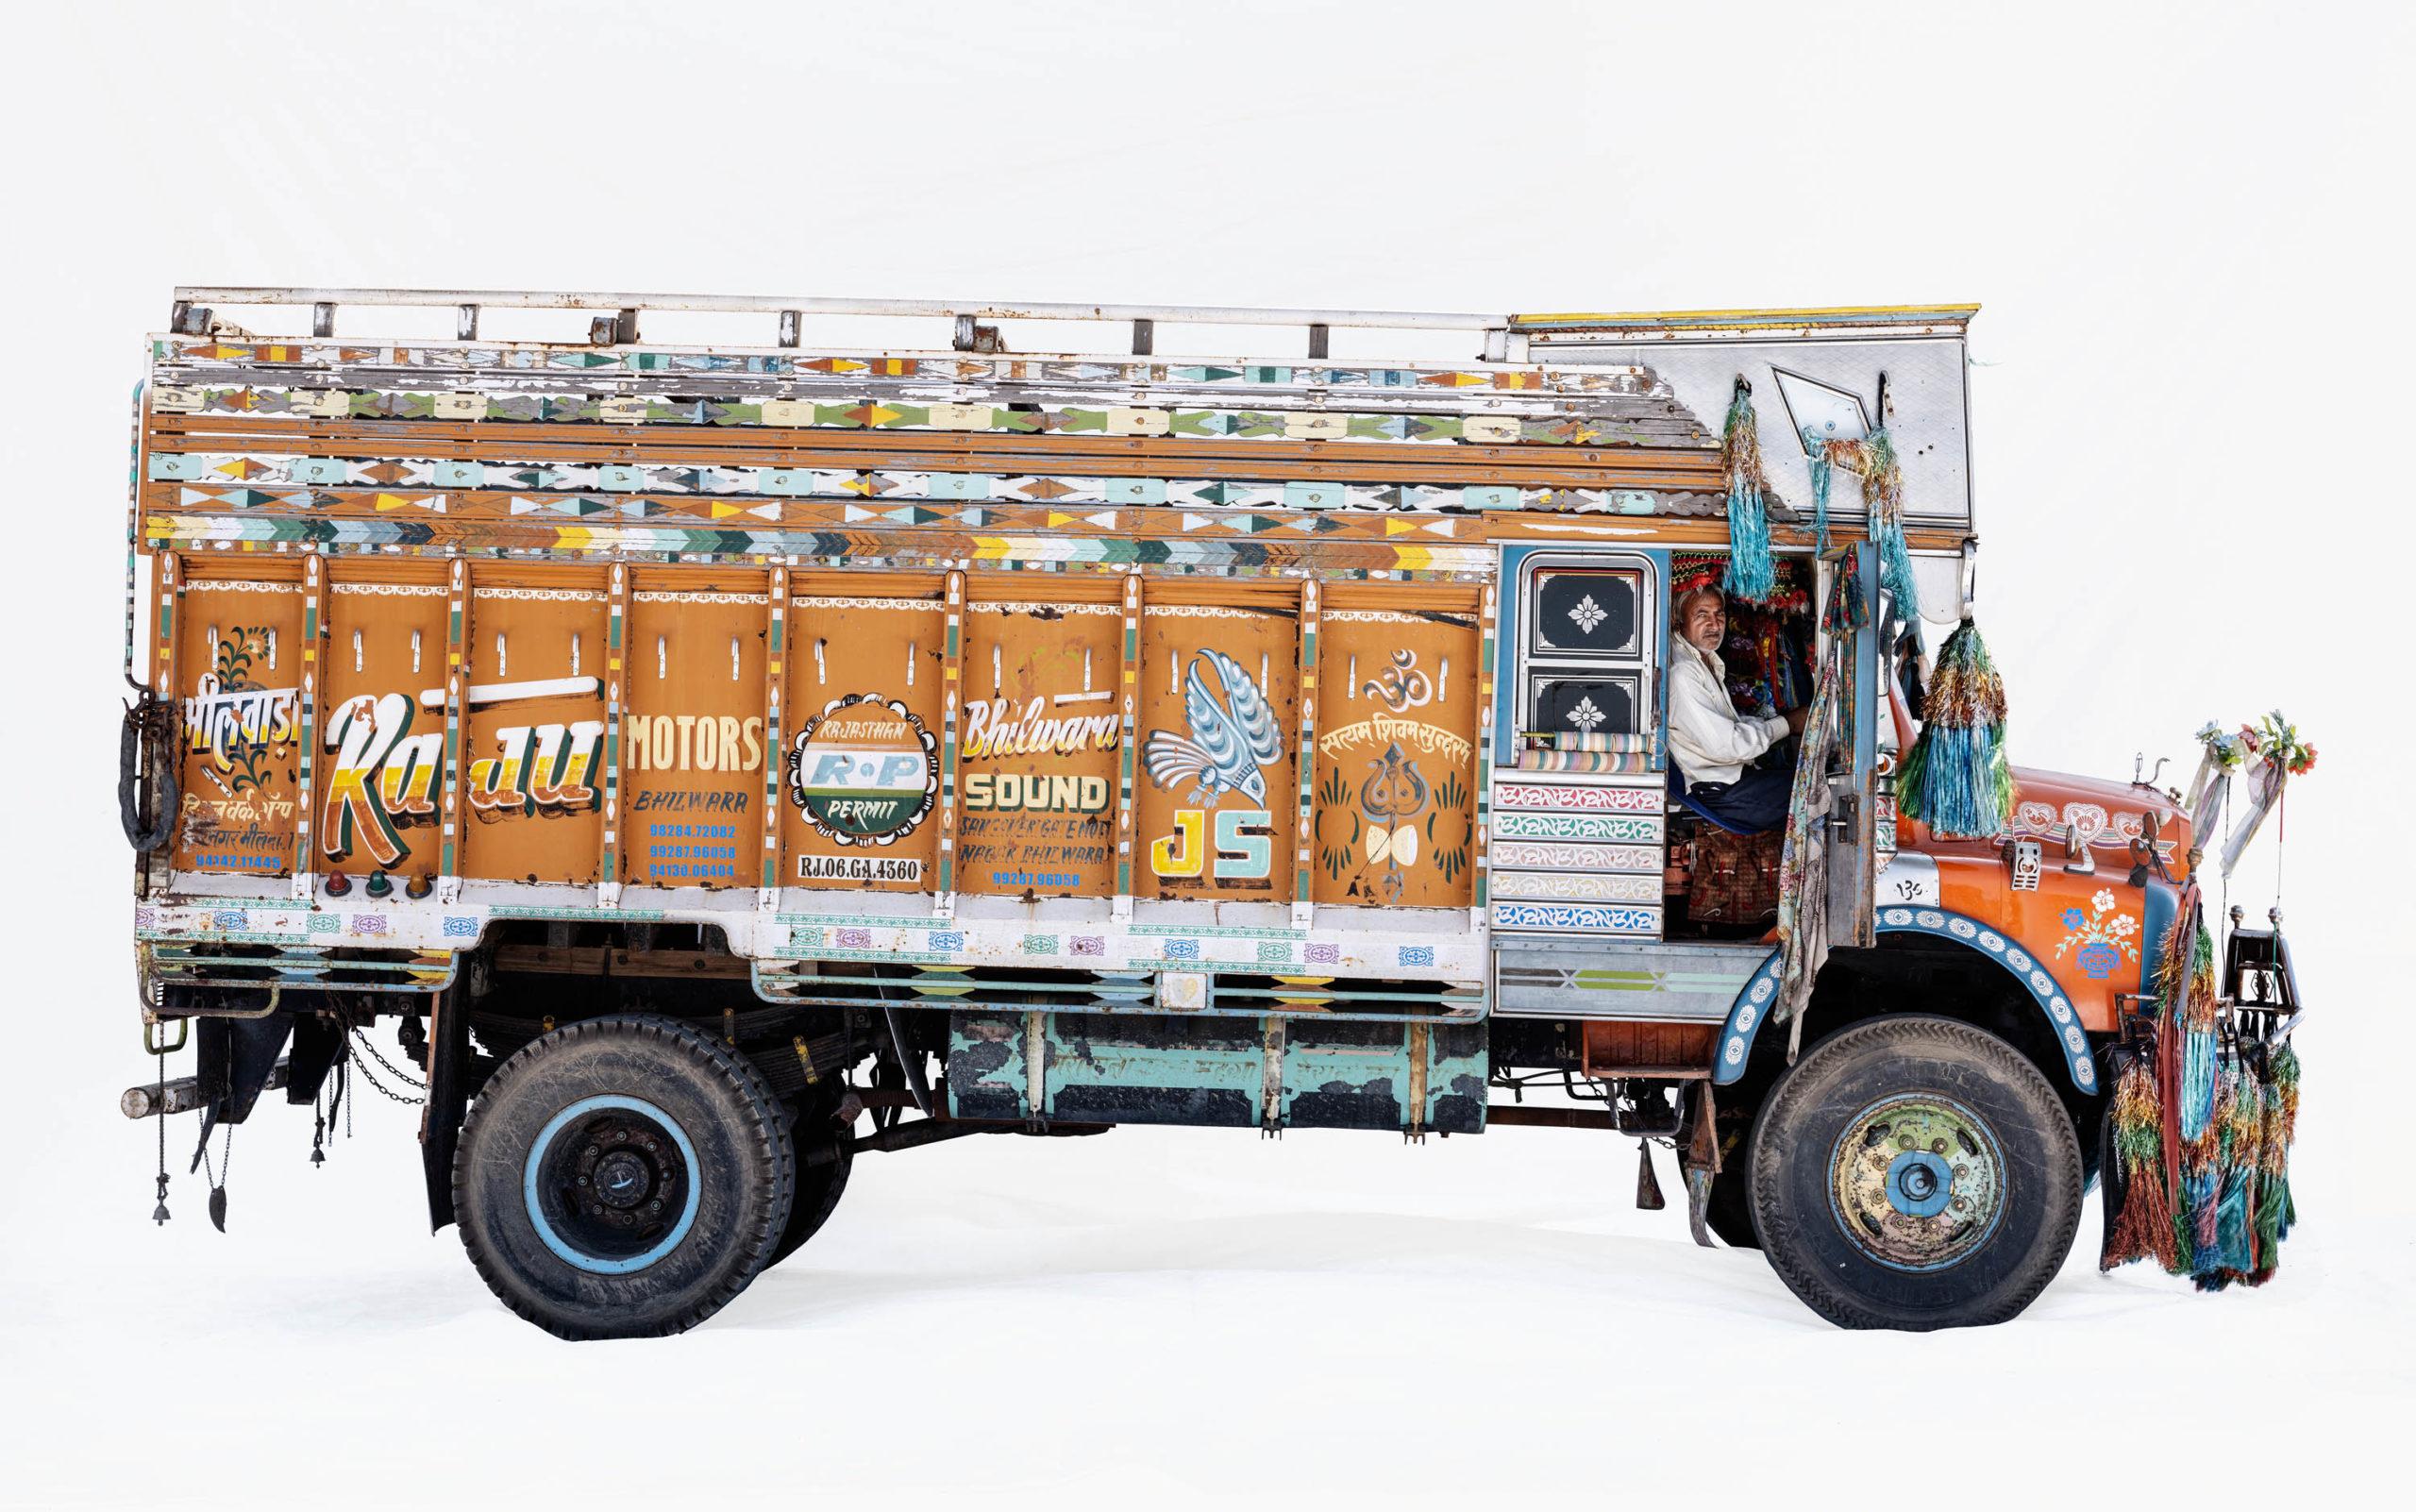 Tata S 1210; Truck driver Jamanalal Teli (Bhilwara, Rajasthan)